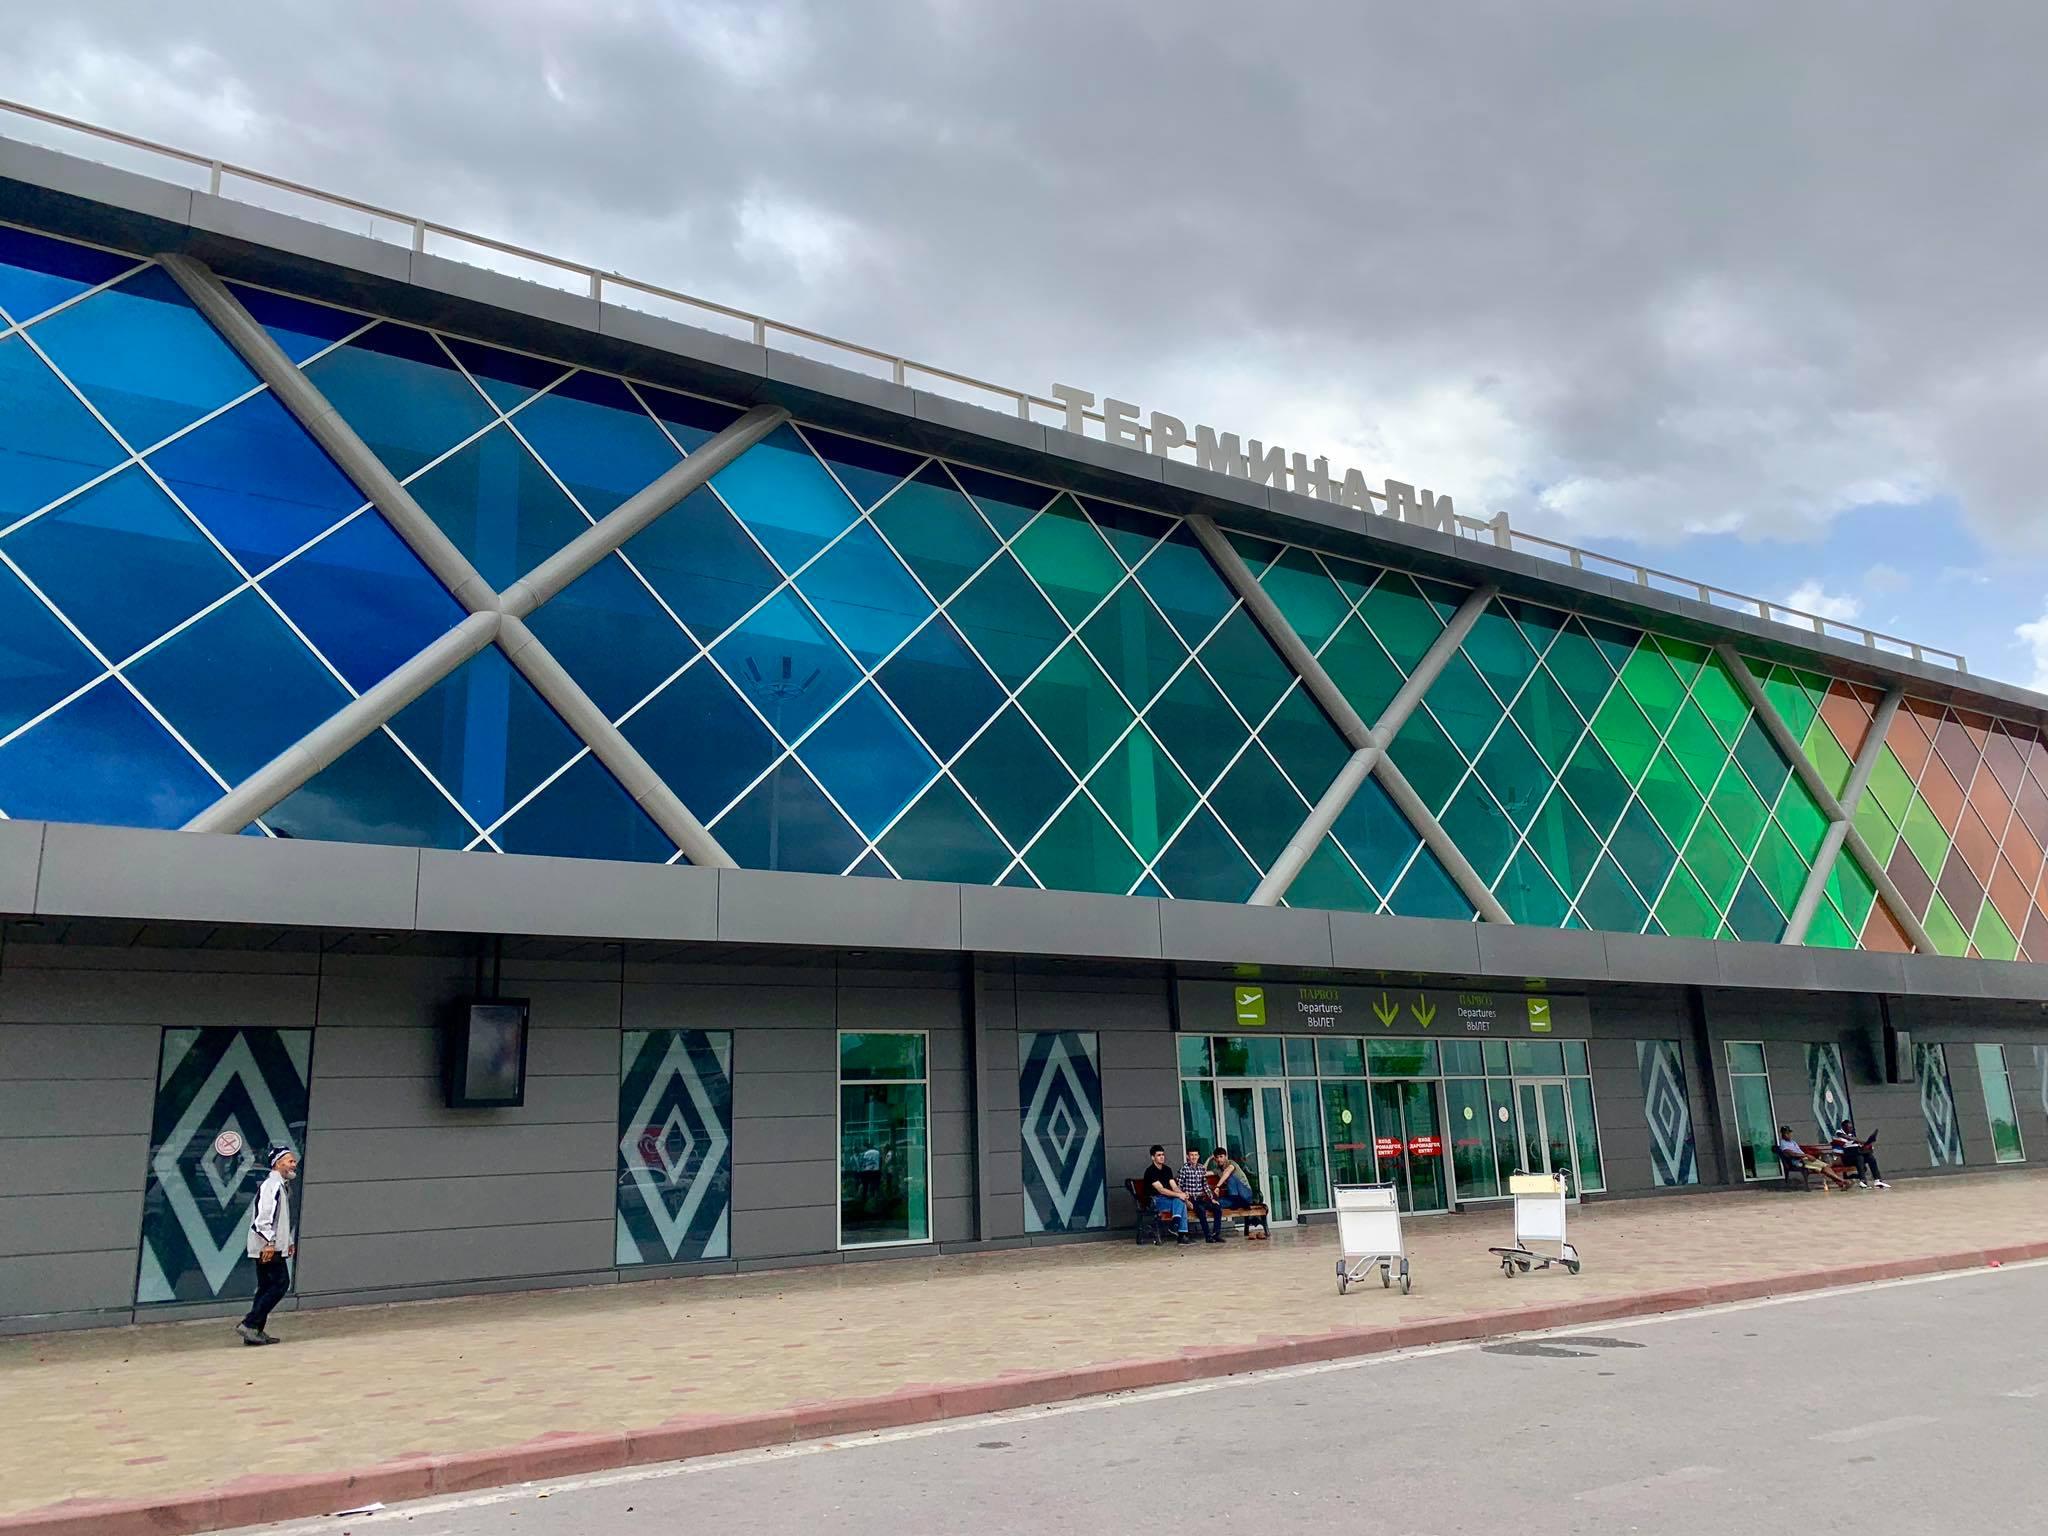 Kach Solo Travels in 2019 I just arrived in Dushanbe, Tajikistan1.jpg